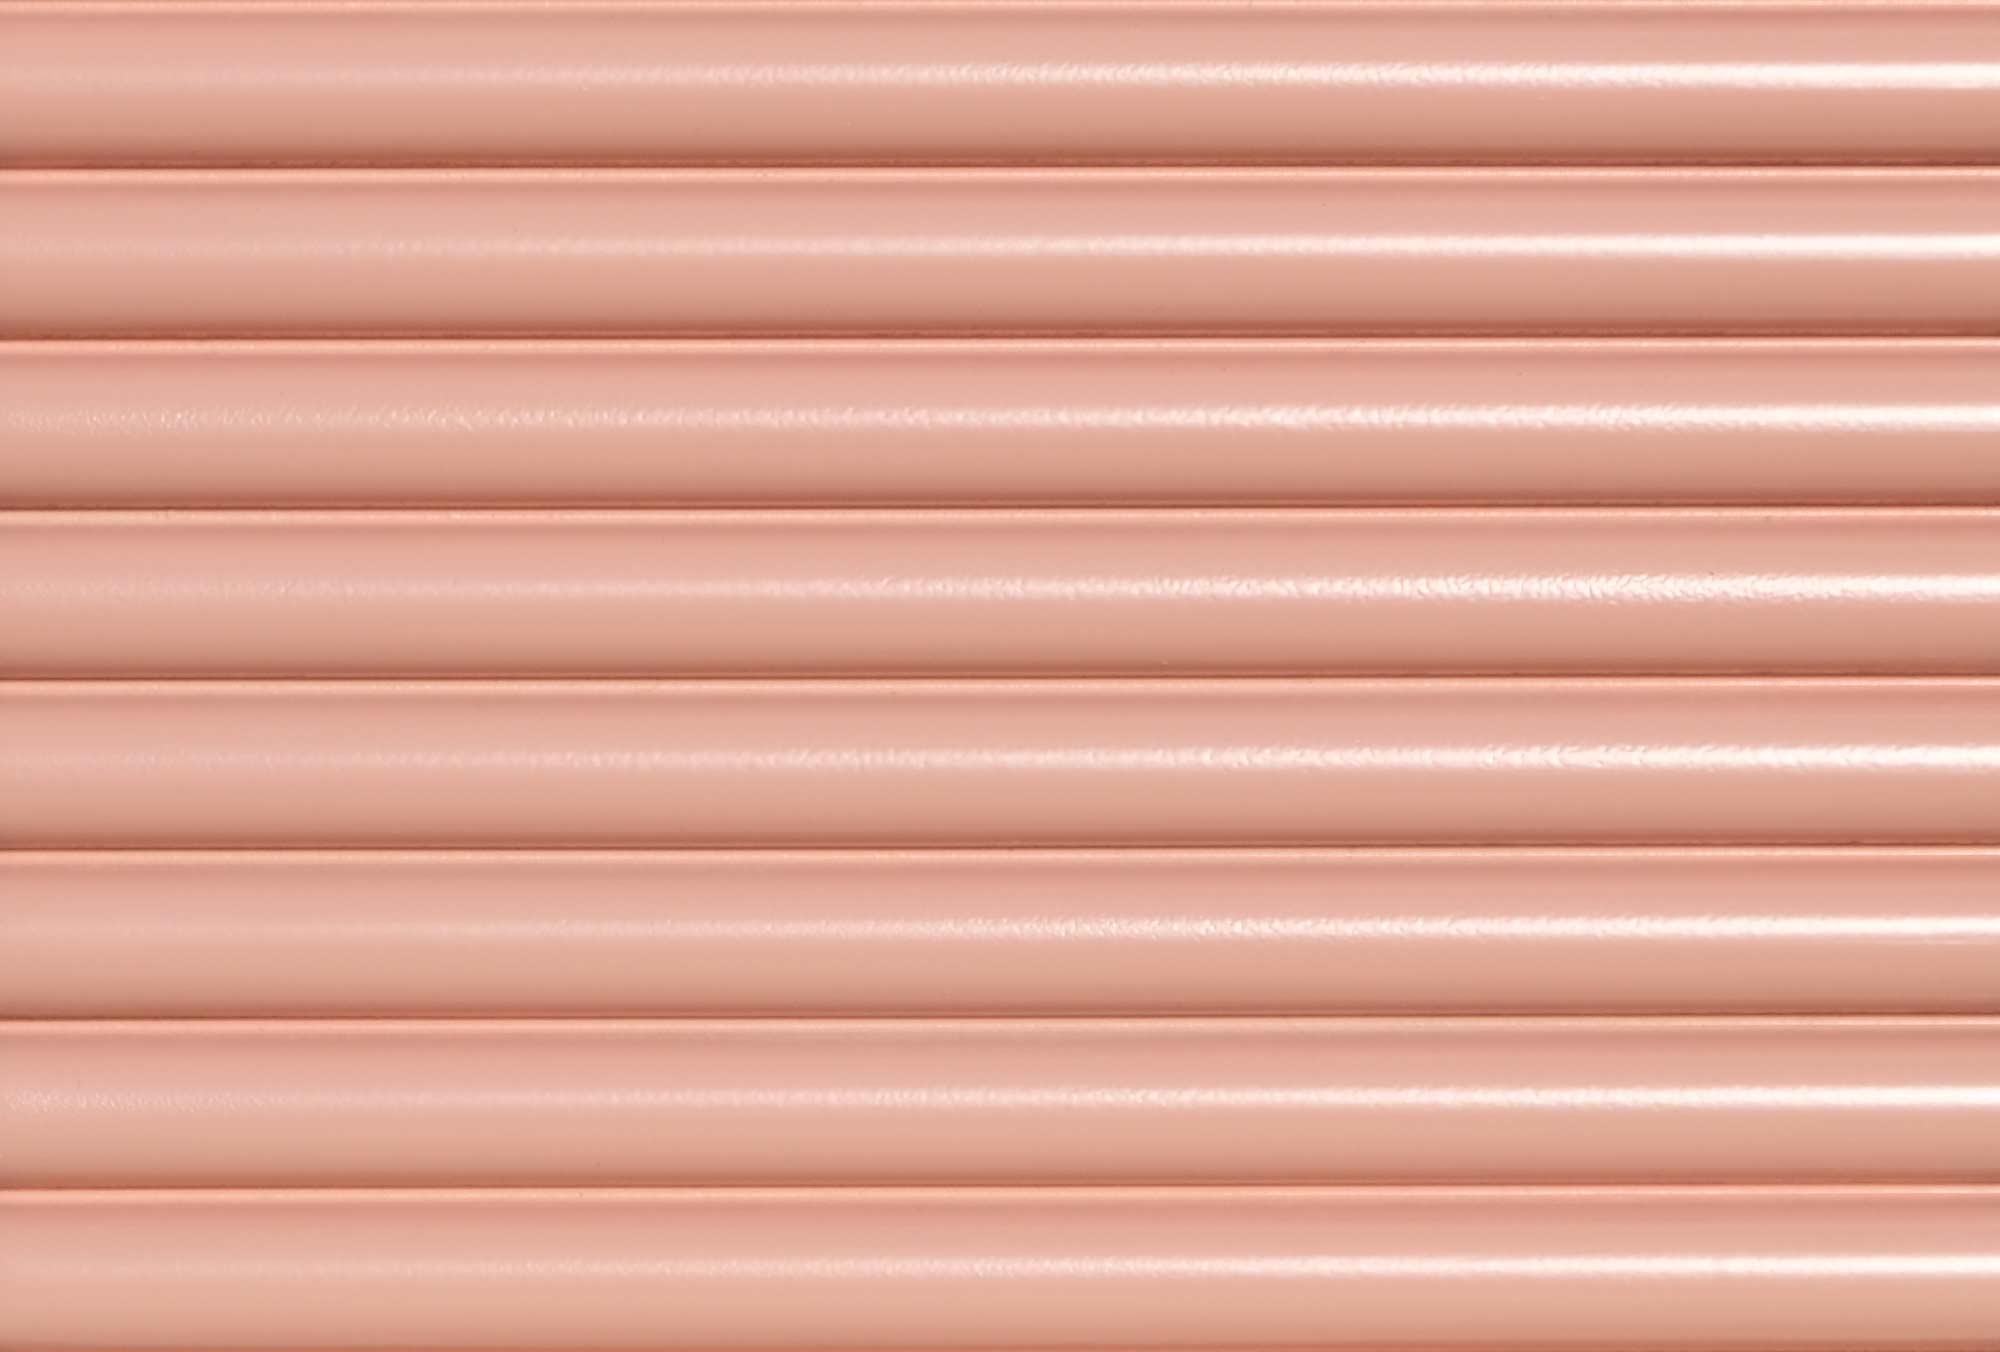 3d-wandpaneele-mdf-rosa-lackiert-tube-alarm